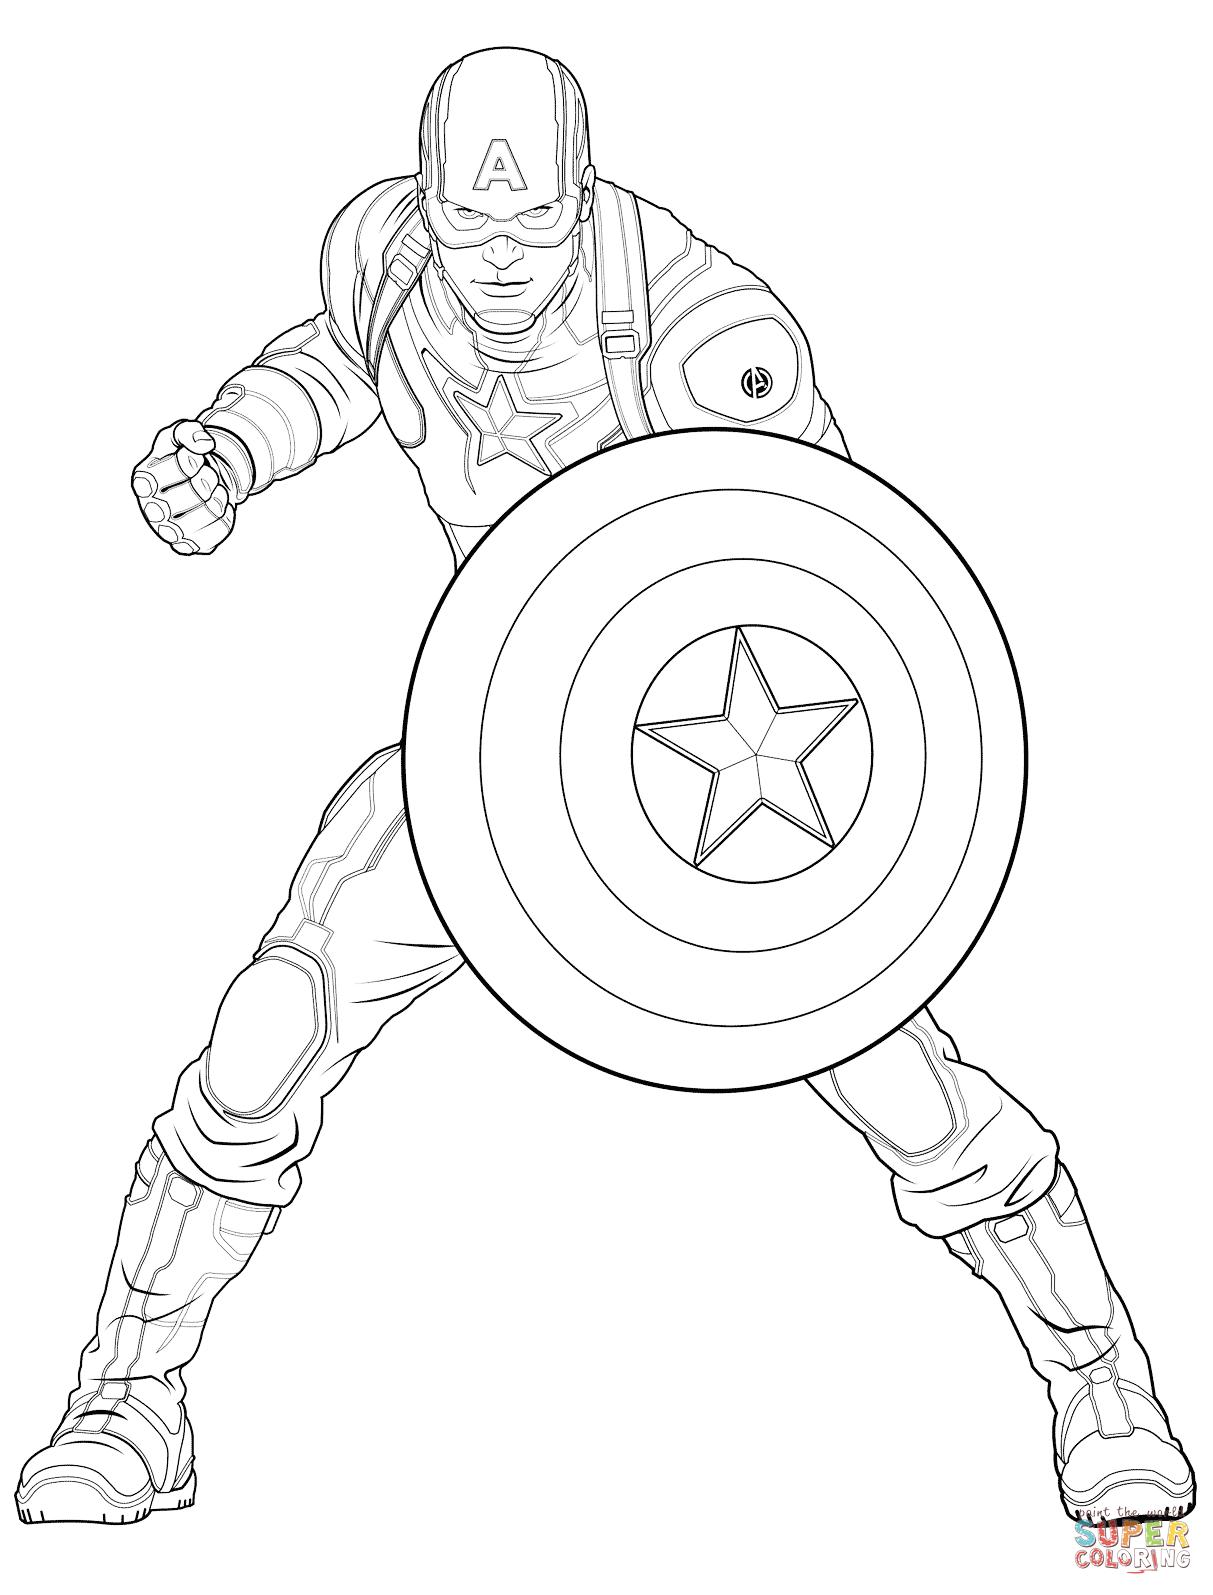 Spiderman Civil War Drawing at GetDrawings.com | Free for personal ...